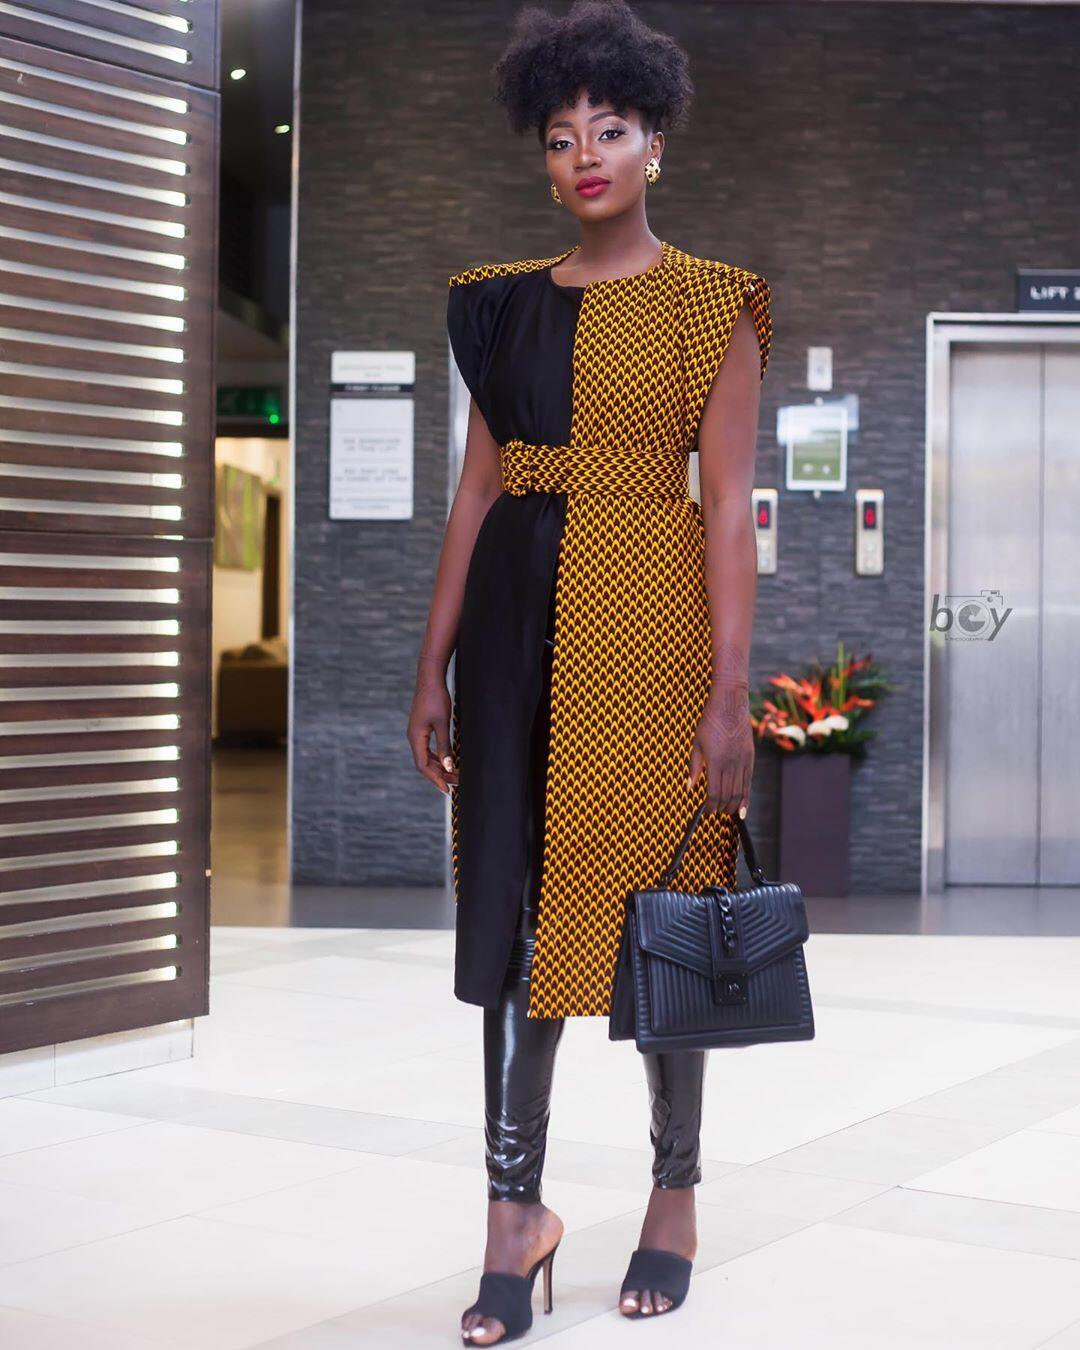 Nora Ndem in African Print Coat